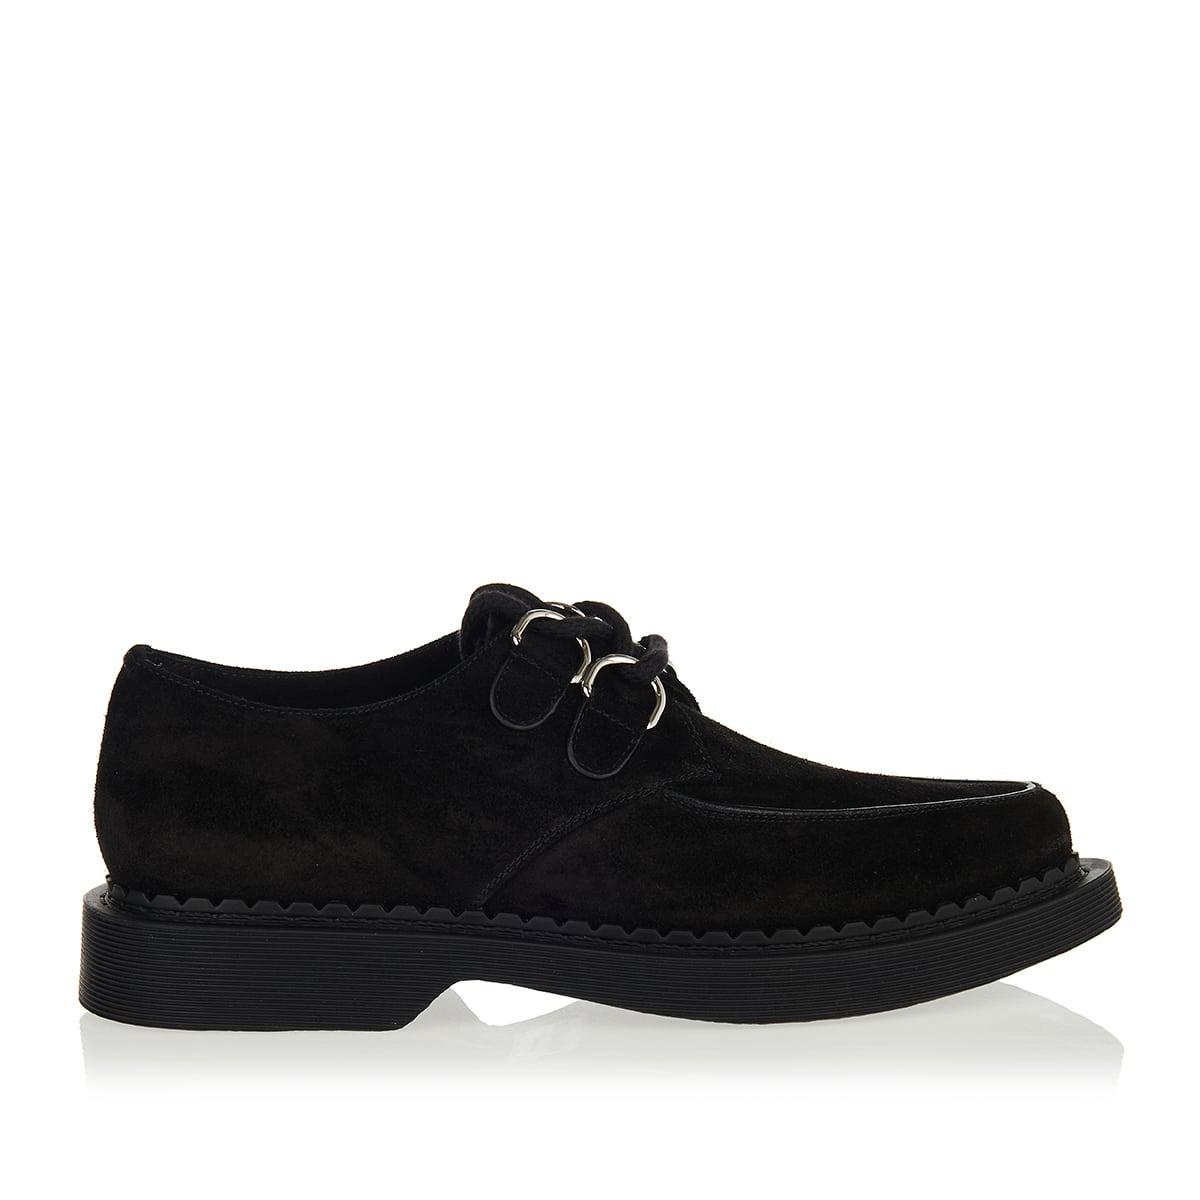 Teddy suede derby shoes